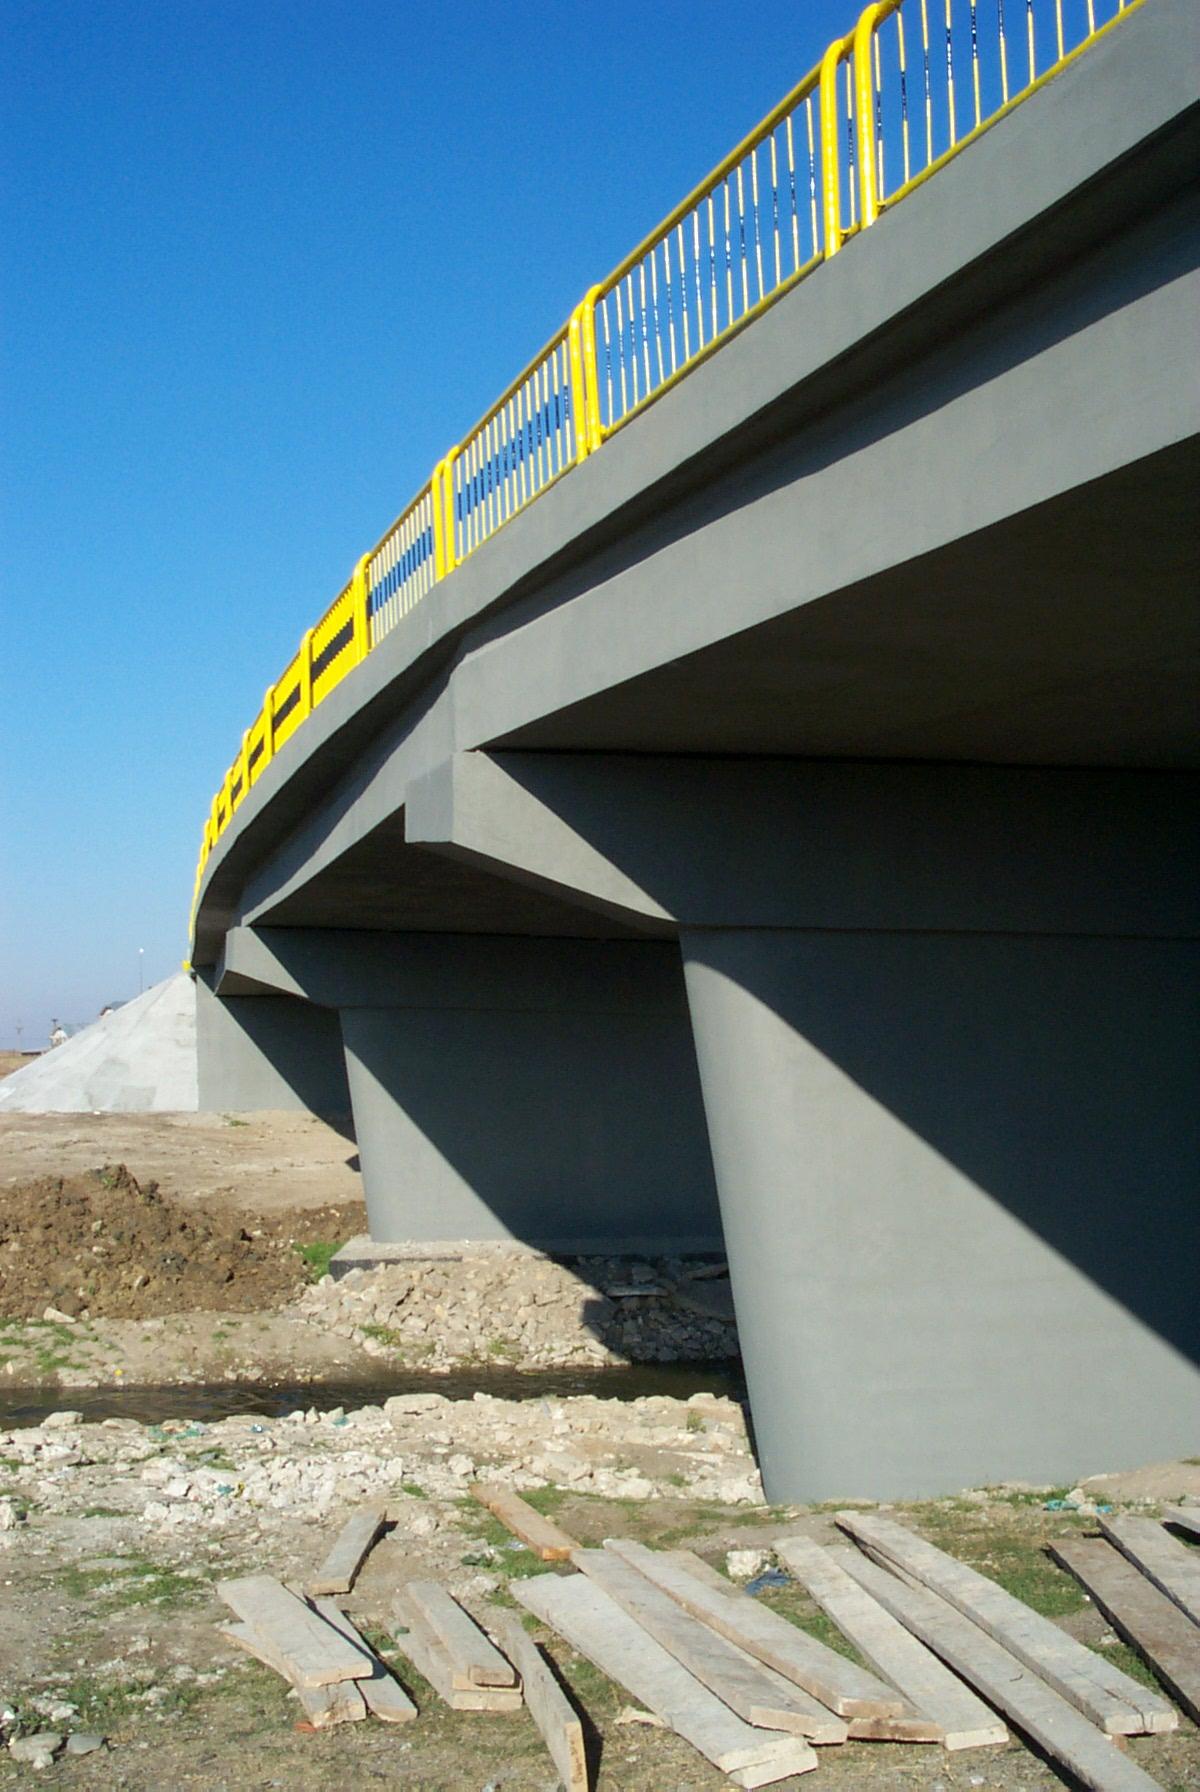 Reparatii pod (DN2), Km. 33 - 028, peste raul Calnistea MAPEI - Poza 119